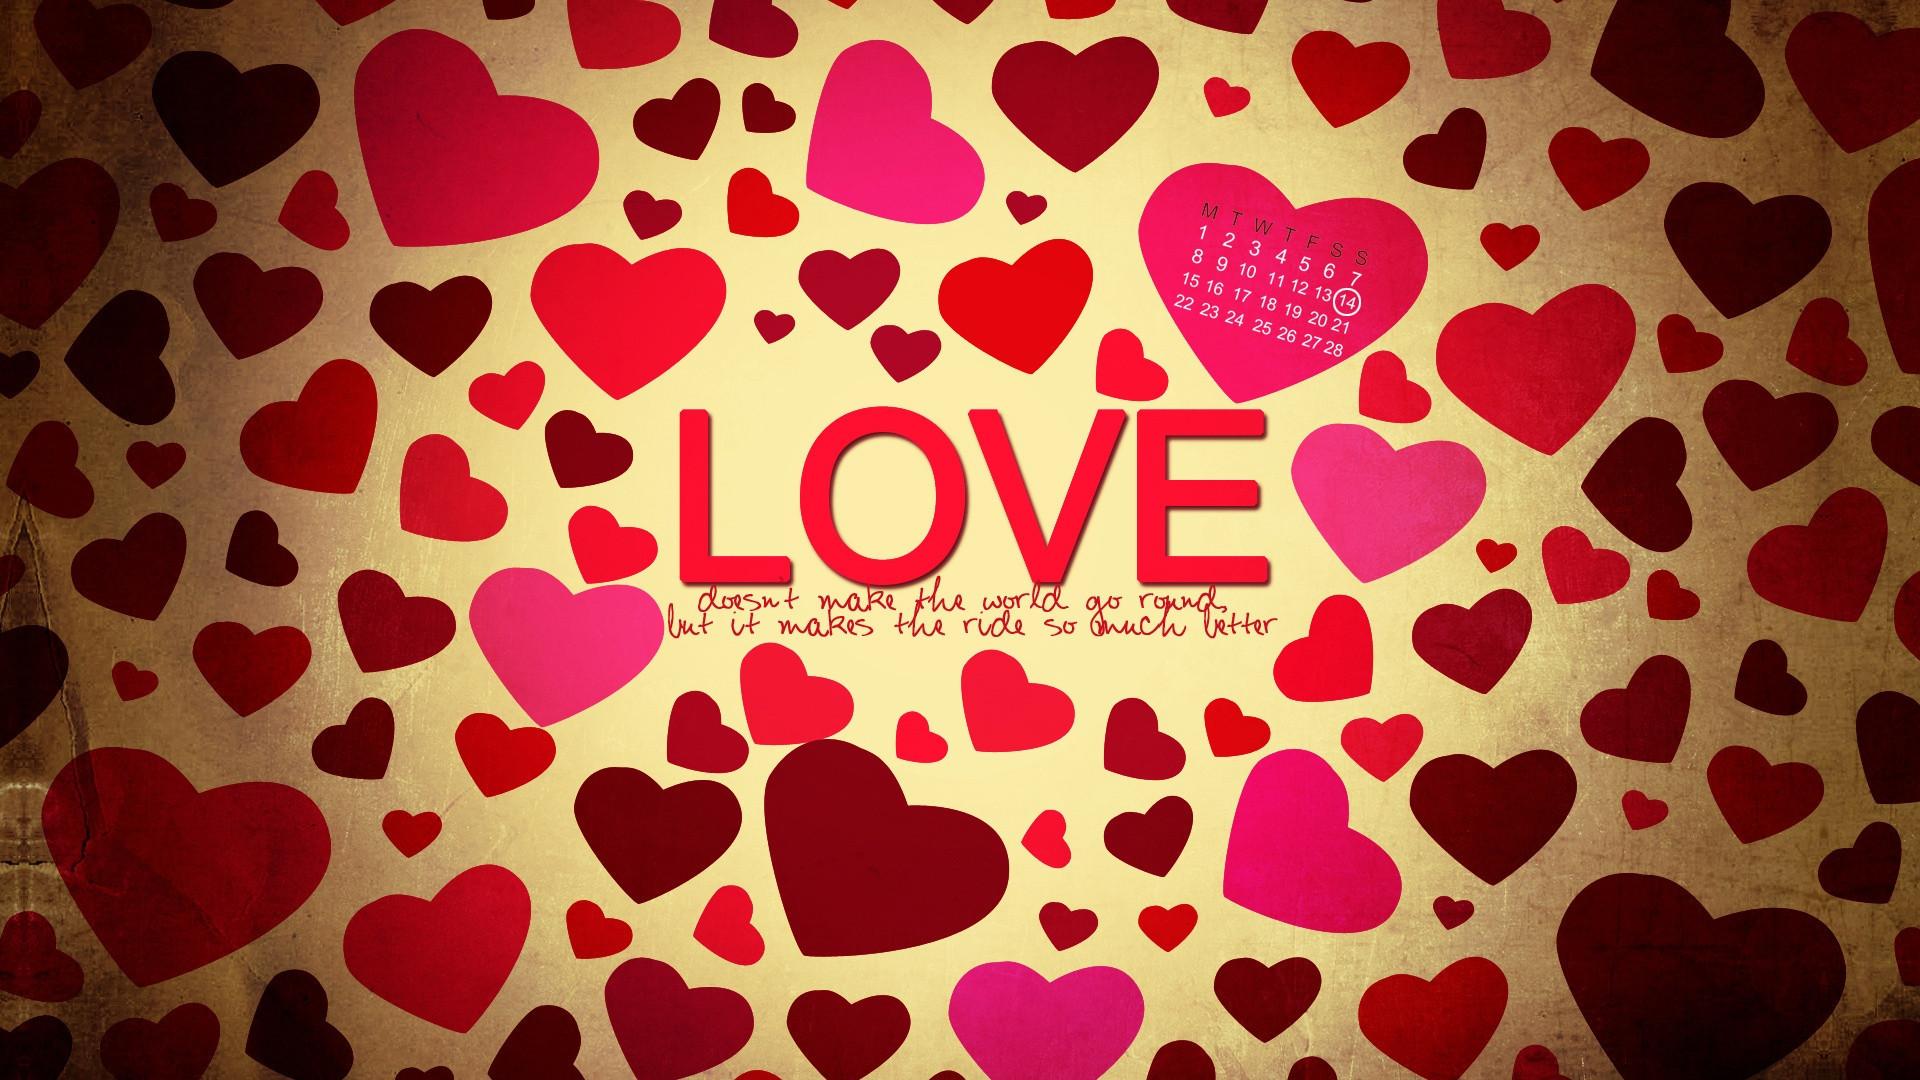 Cool Love Wallpapers Wallpapertag